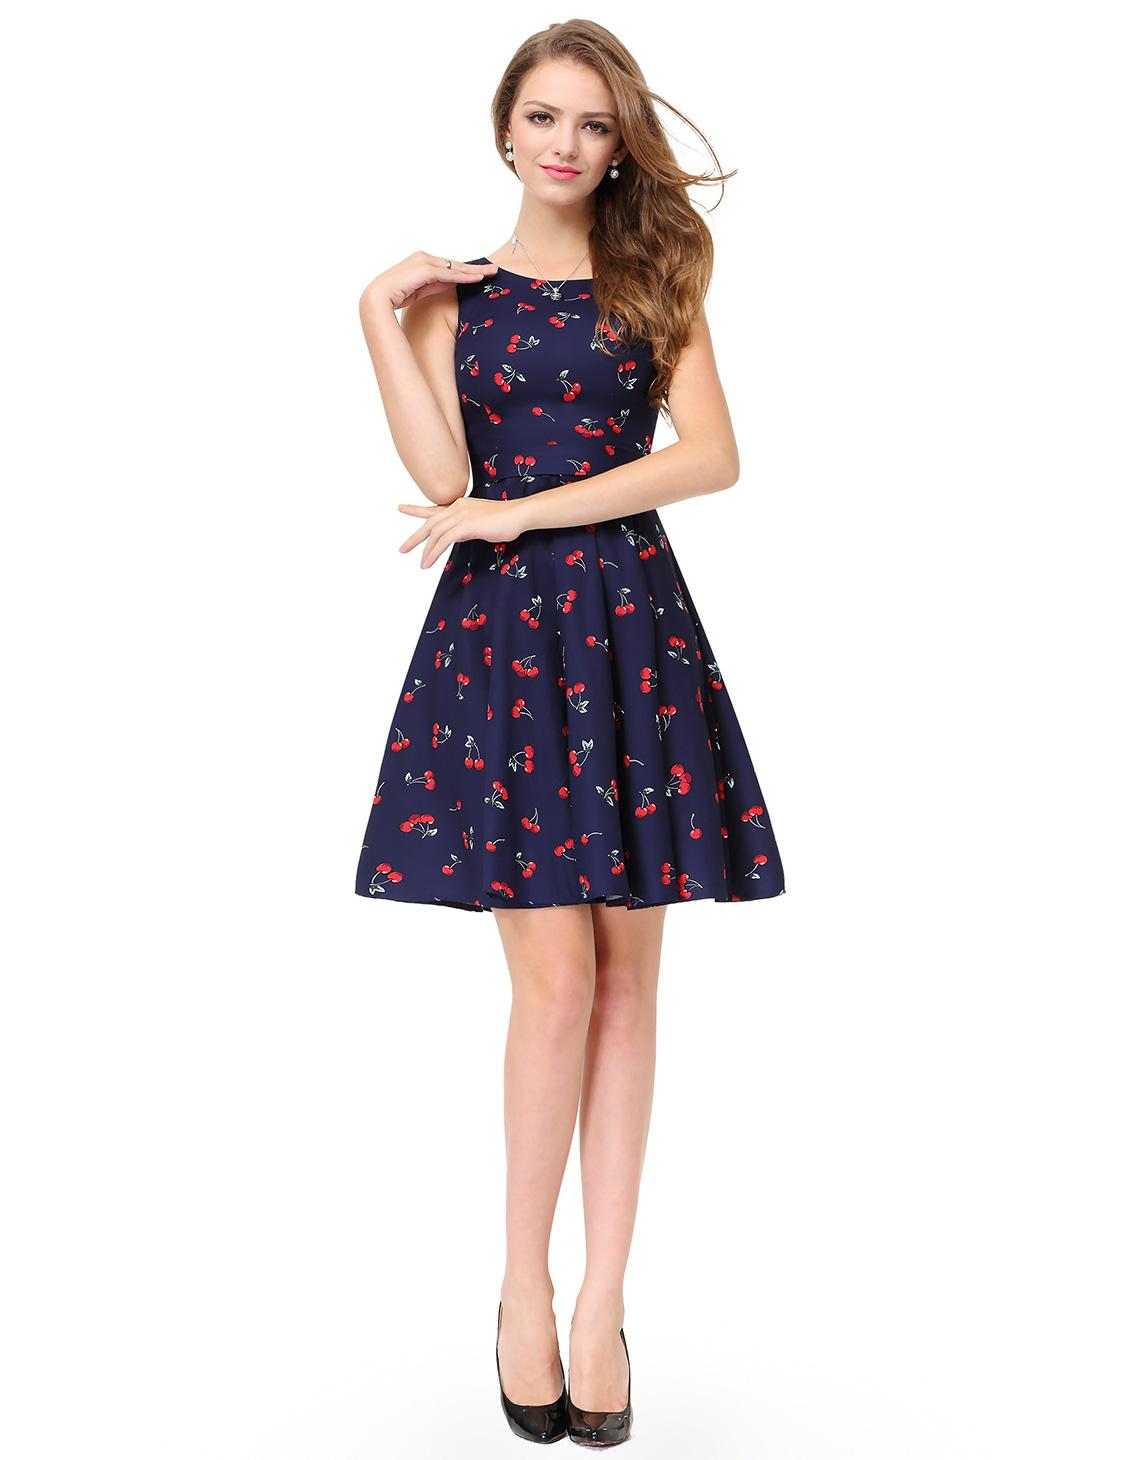 Cocktail dresses Simple Fashion Sleeveless Short Casual Dress 05488 ...